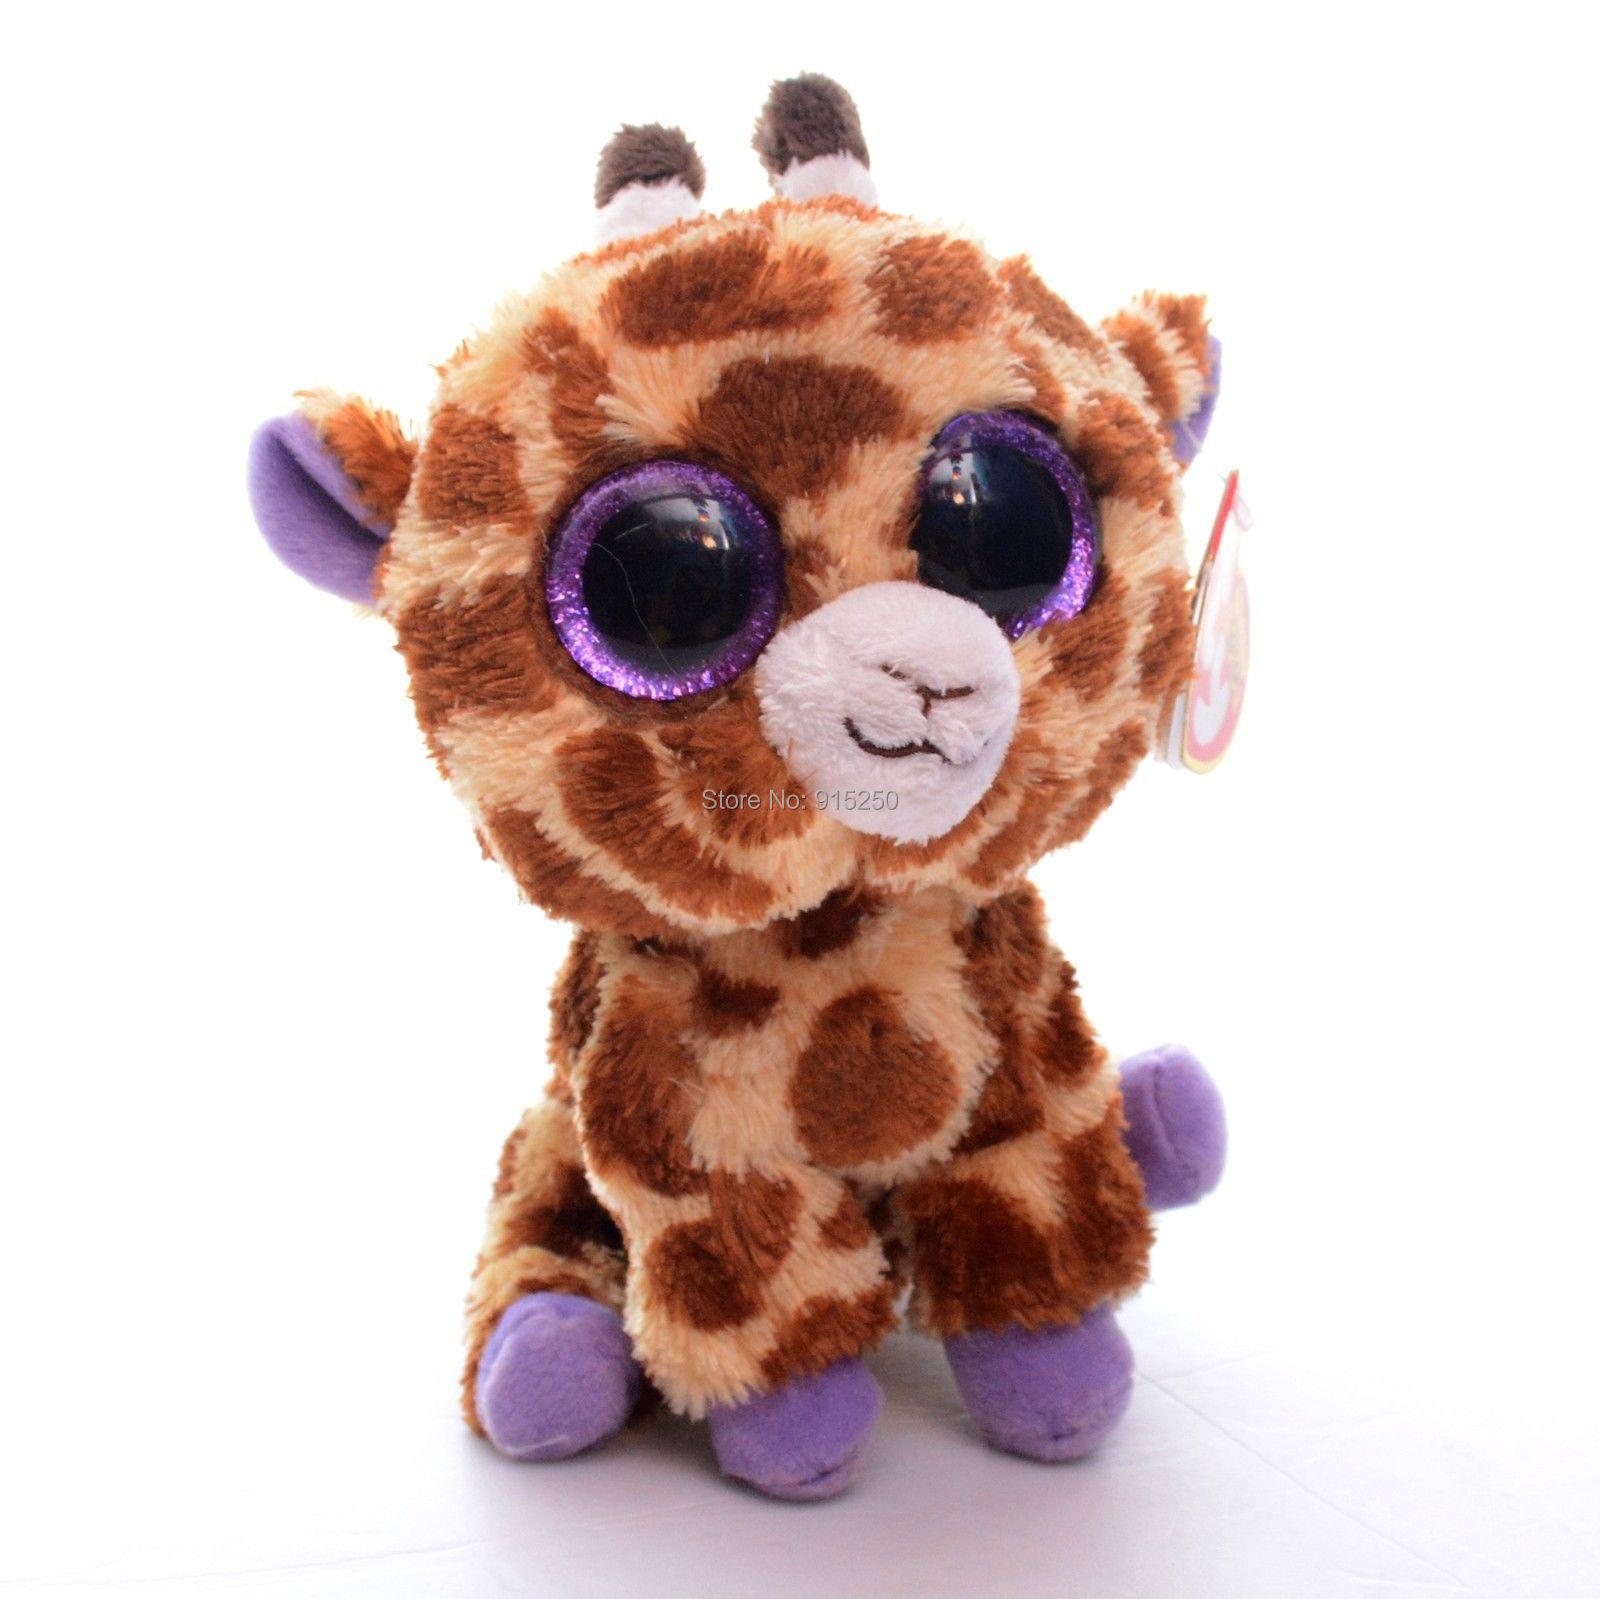 Free Shipping 5'' Original TY Collection Brown SAFARI Giraffe Plush Toys Small Keychain Kids Doll Stuffed Animals Toy #LN(China (Mainland))